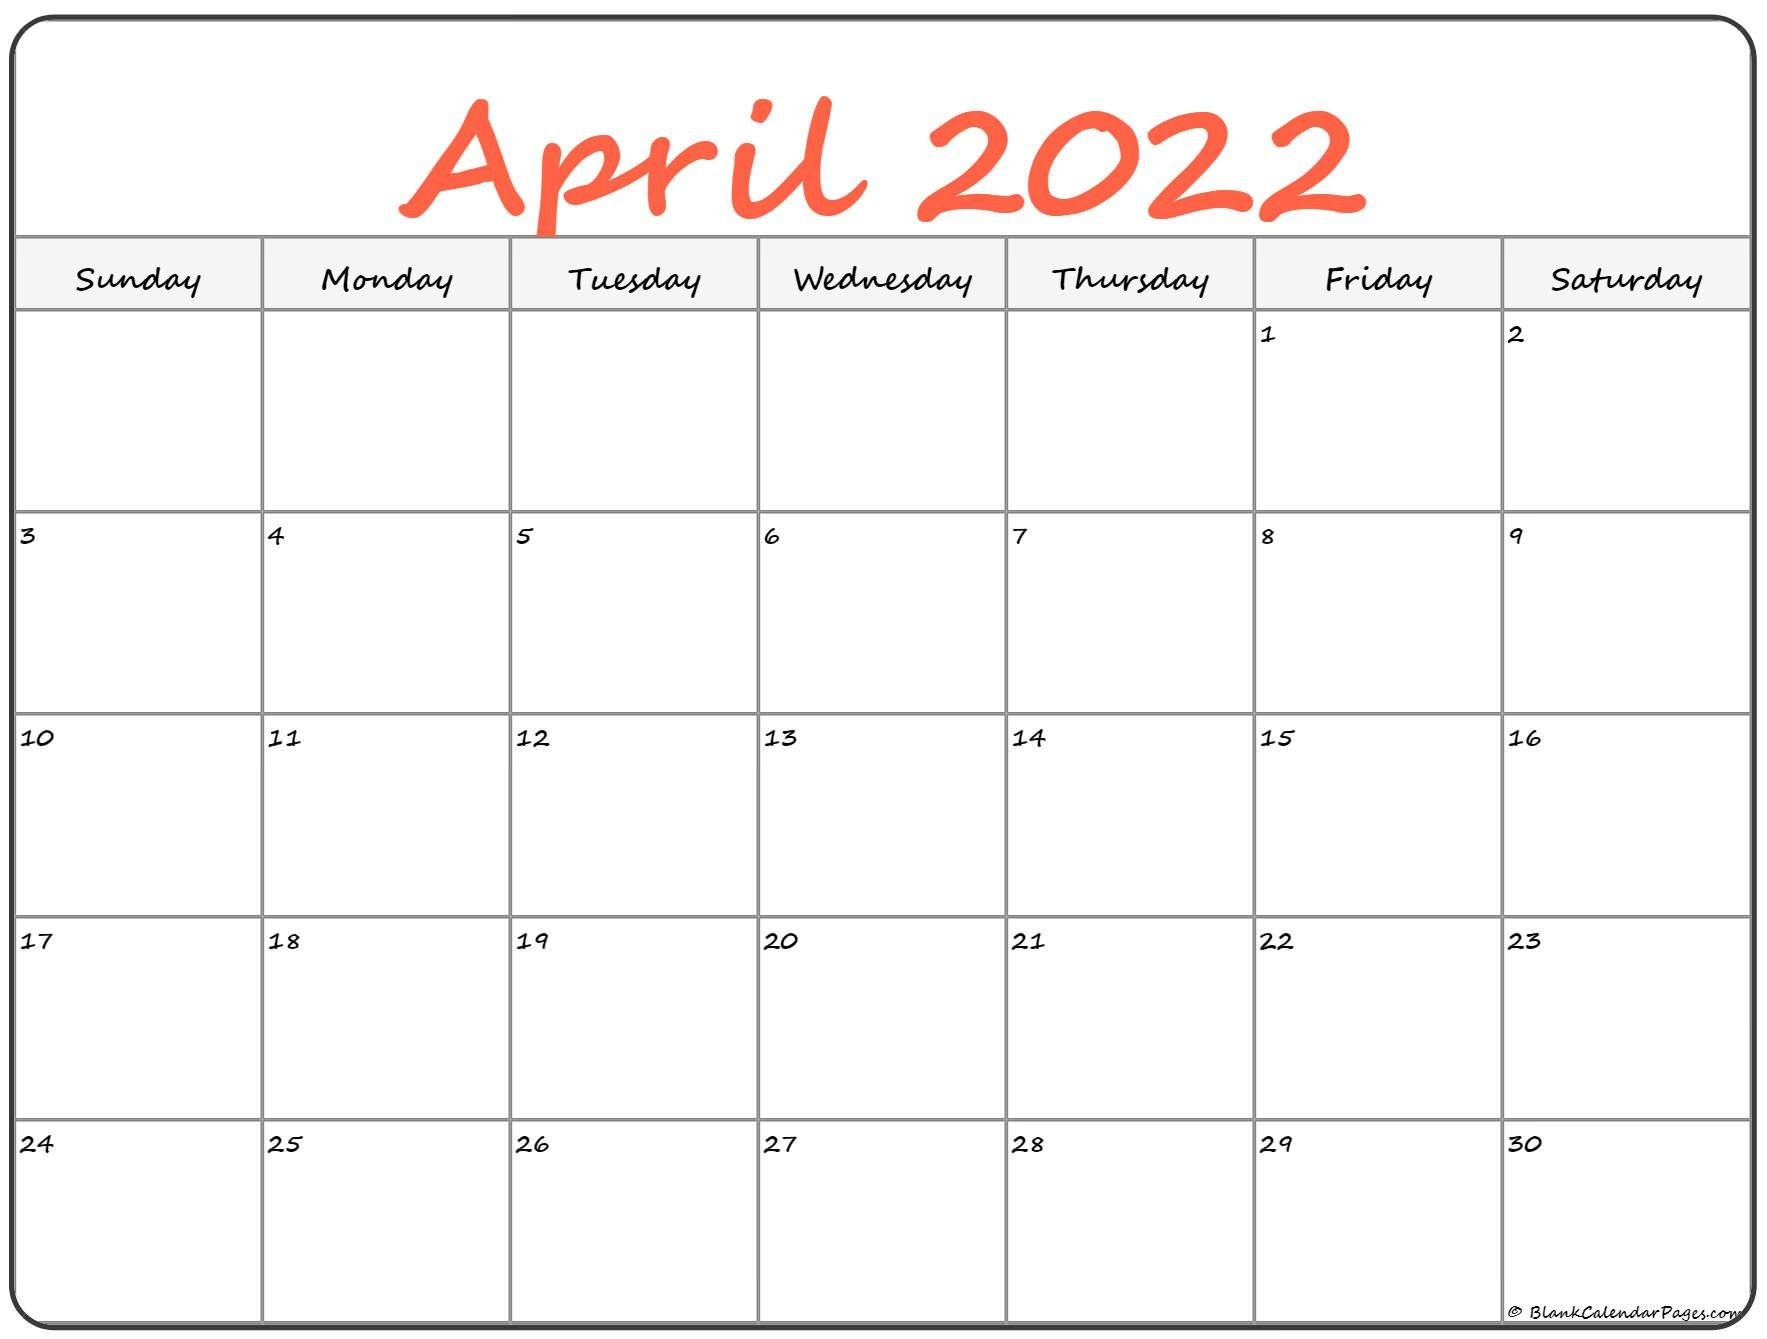 April 2022 Calendar | Free Printable Calendar Templates within April 2022 Calendar Printable Images Photo